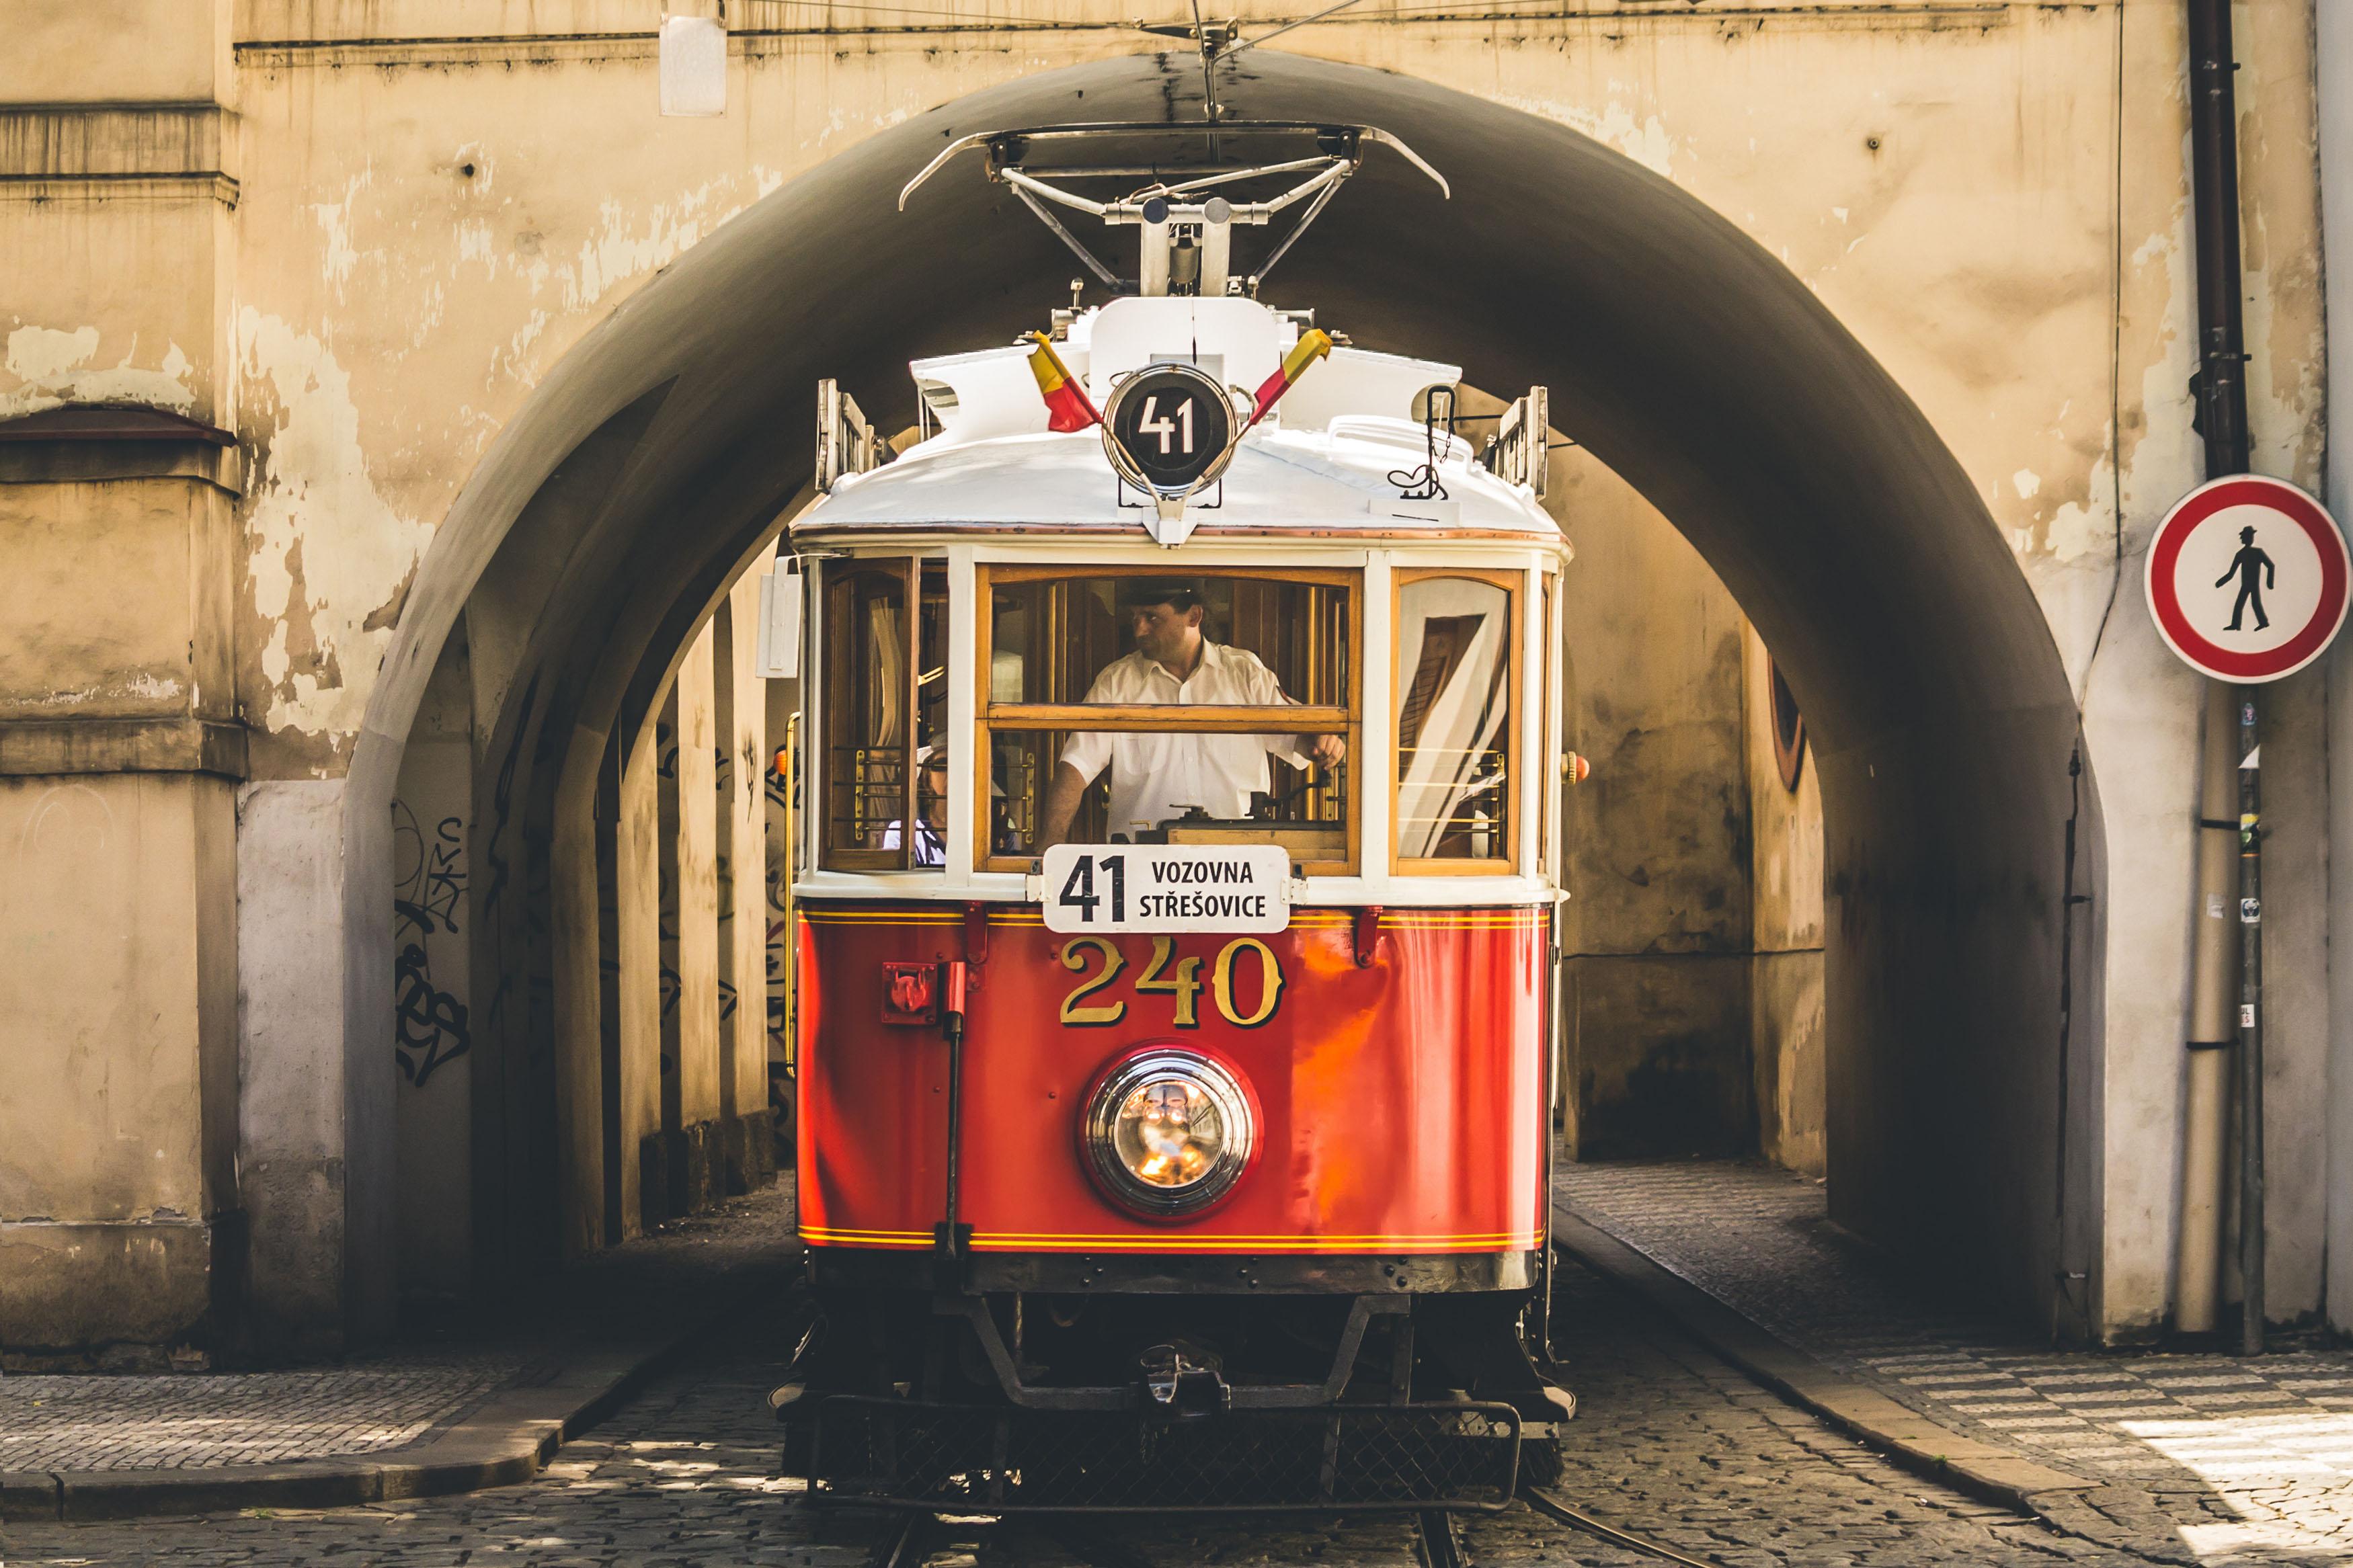 tram pulling through an arch in prague